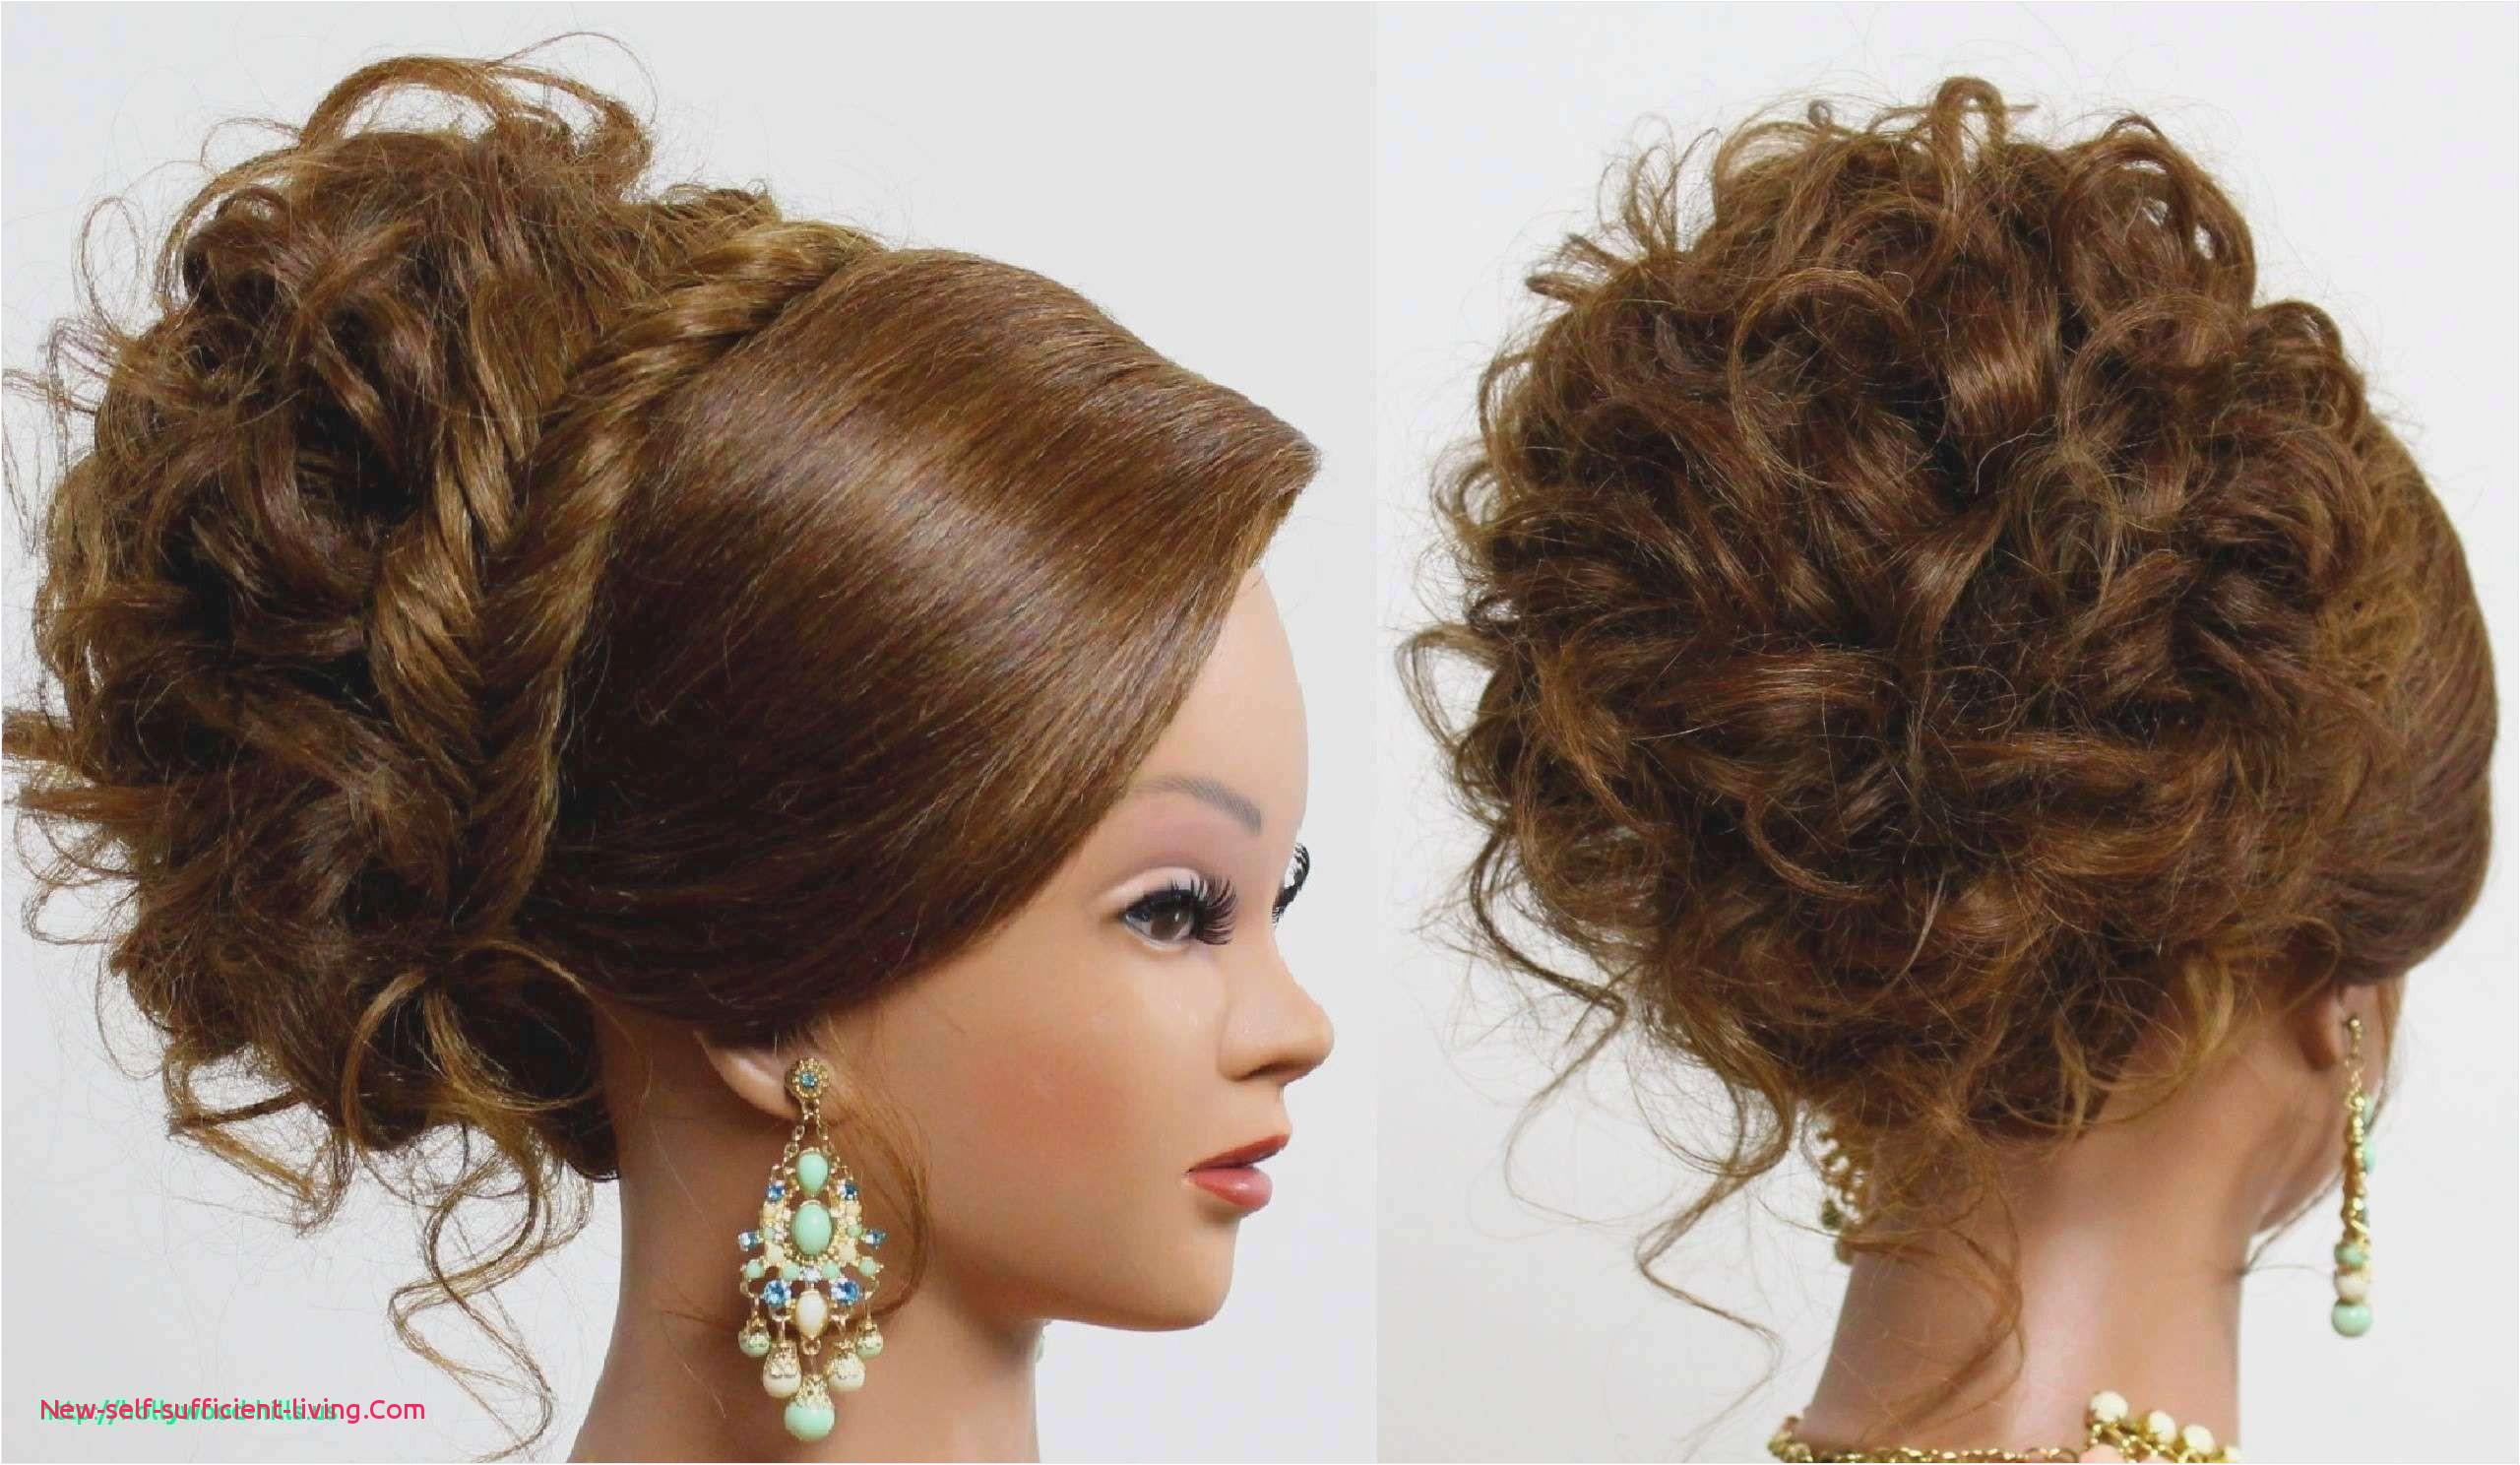 Elegant evening Hairstyles for Short Hair Lovely Elegant evening Hairstyles for Long Hair Awesome Haircuts 0d